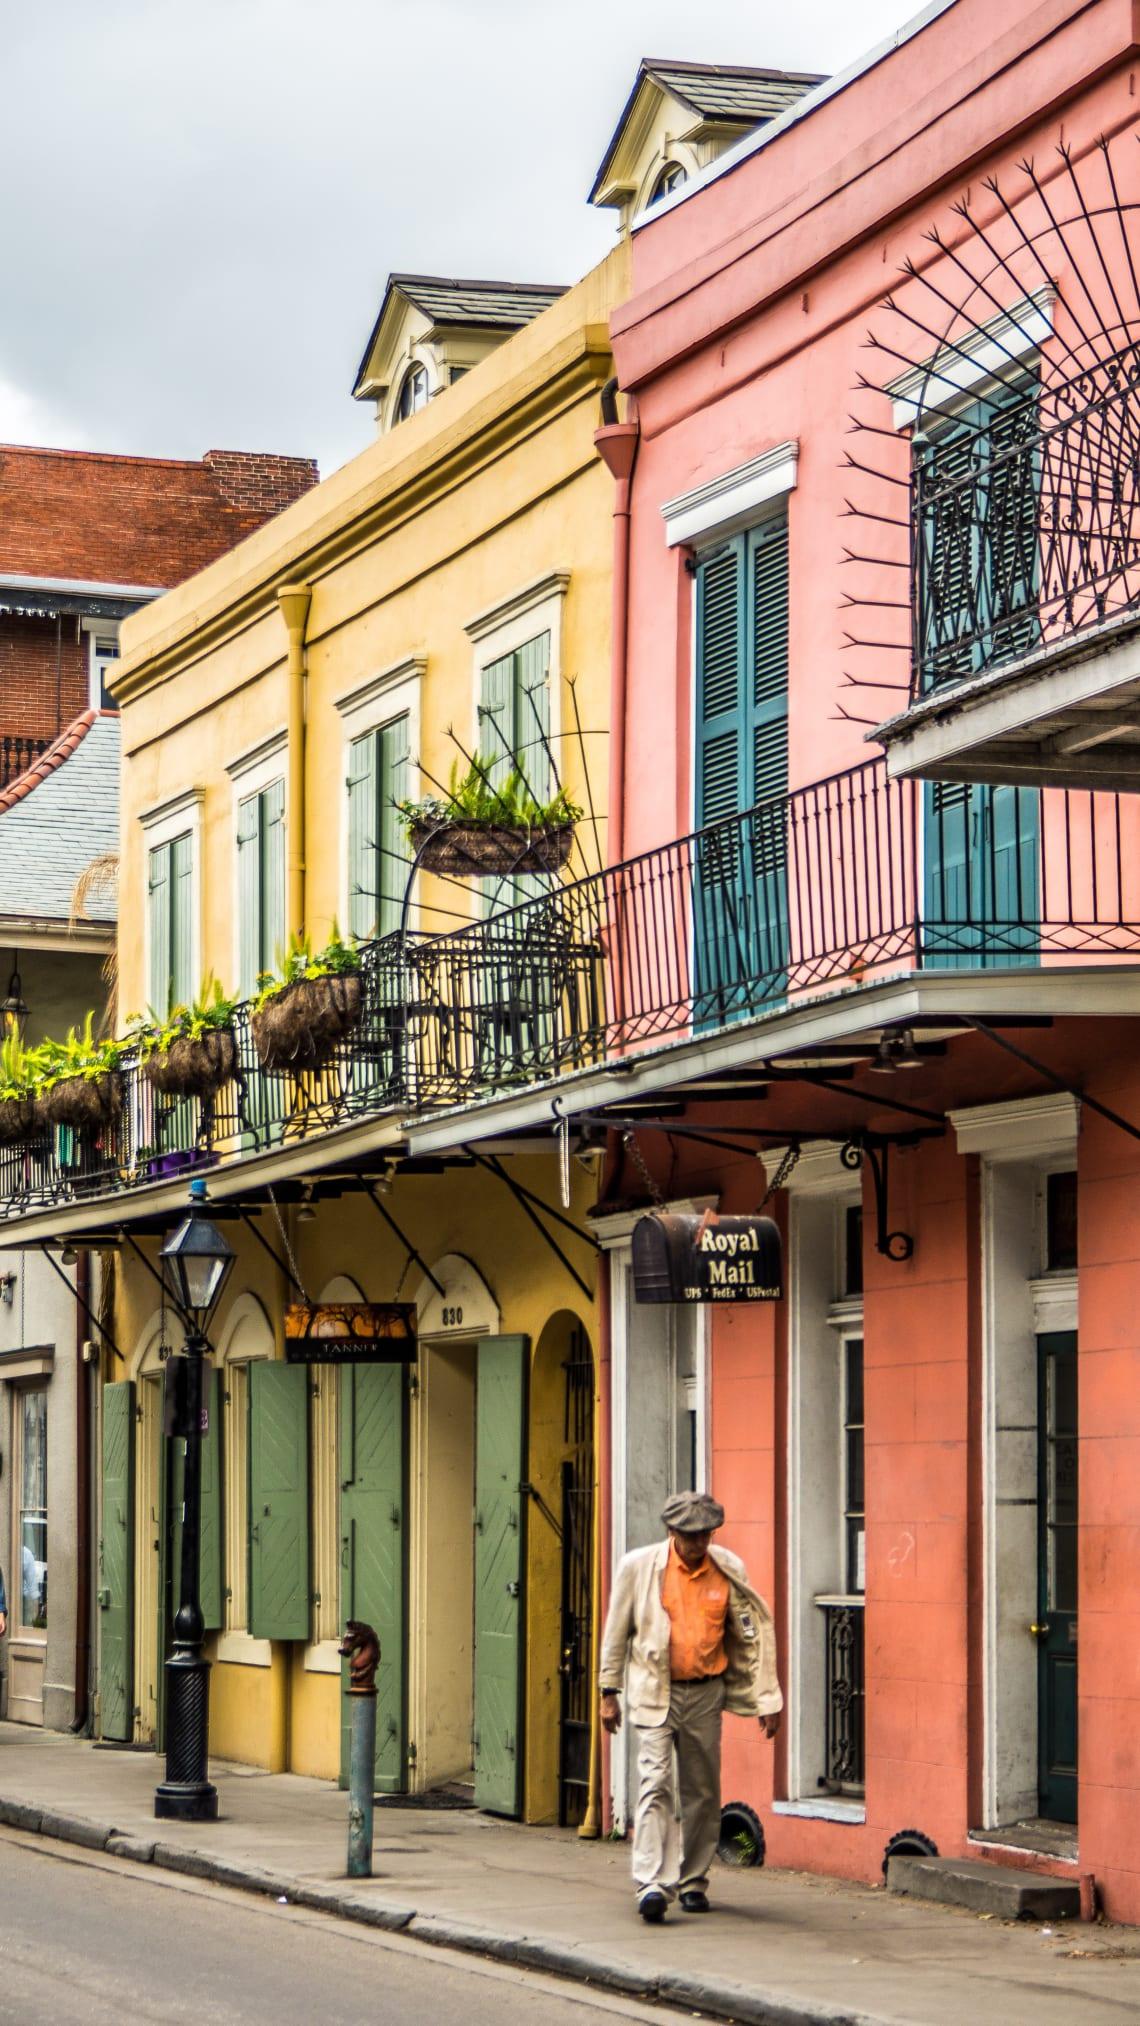 USA travel guide: Louisiana